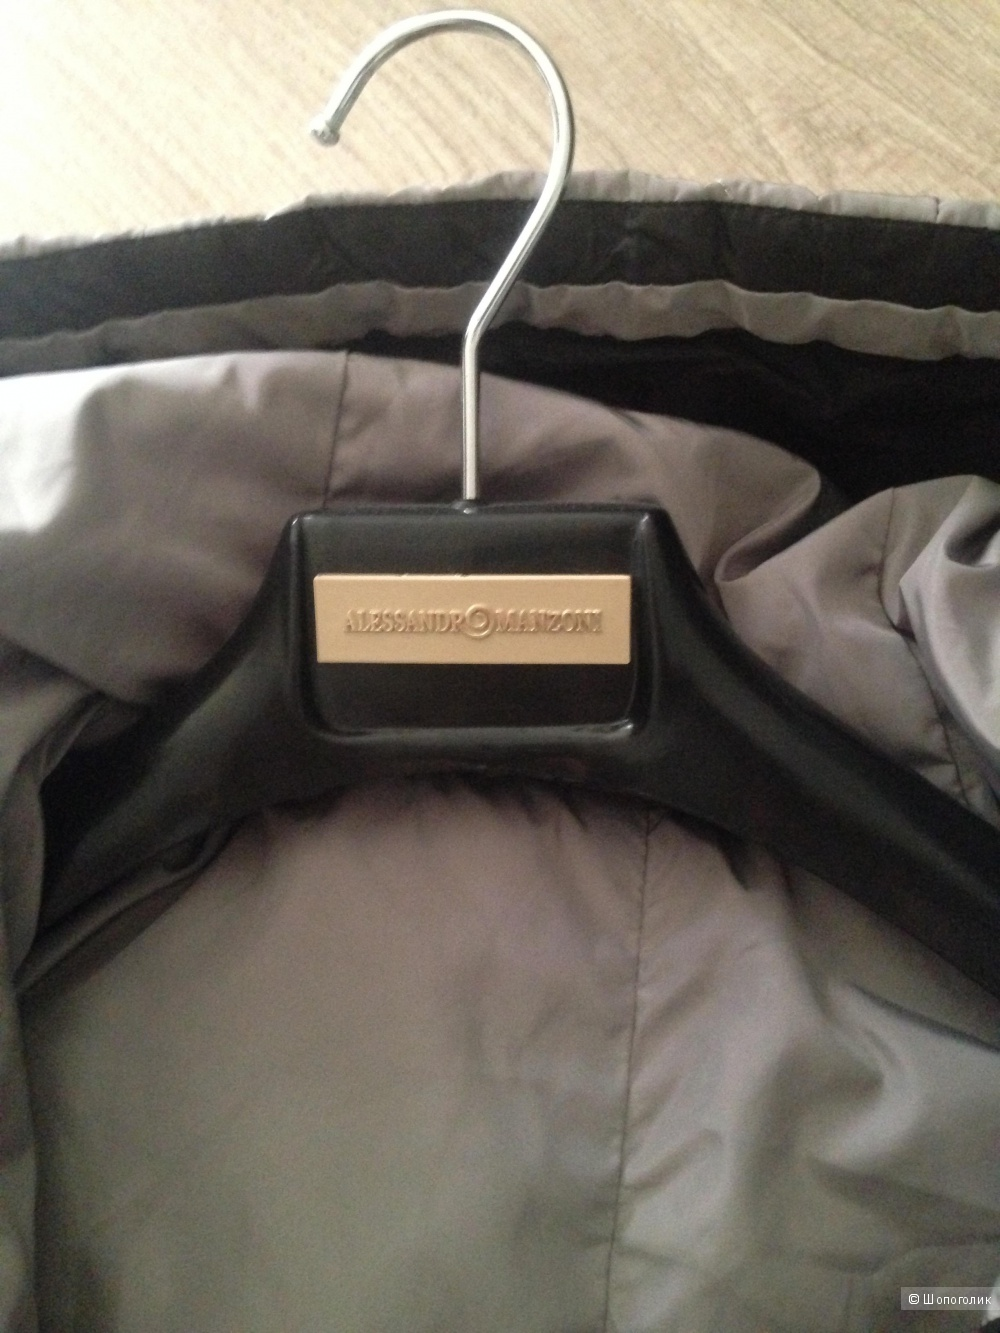 Пальто двустороннее от Alessandro Manzoni, размер 46